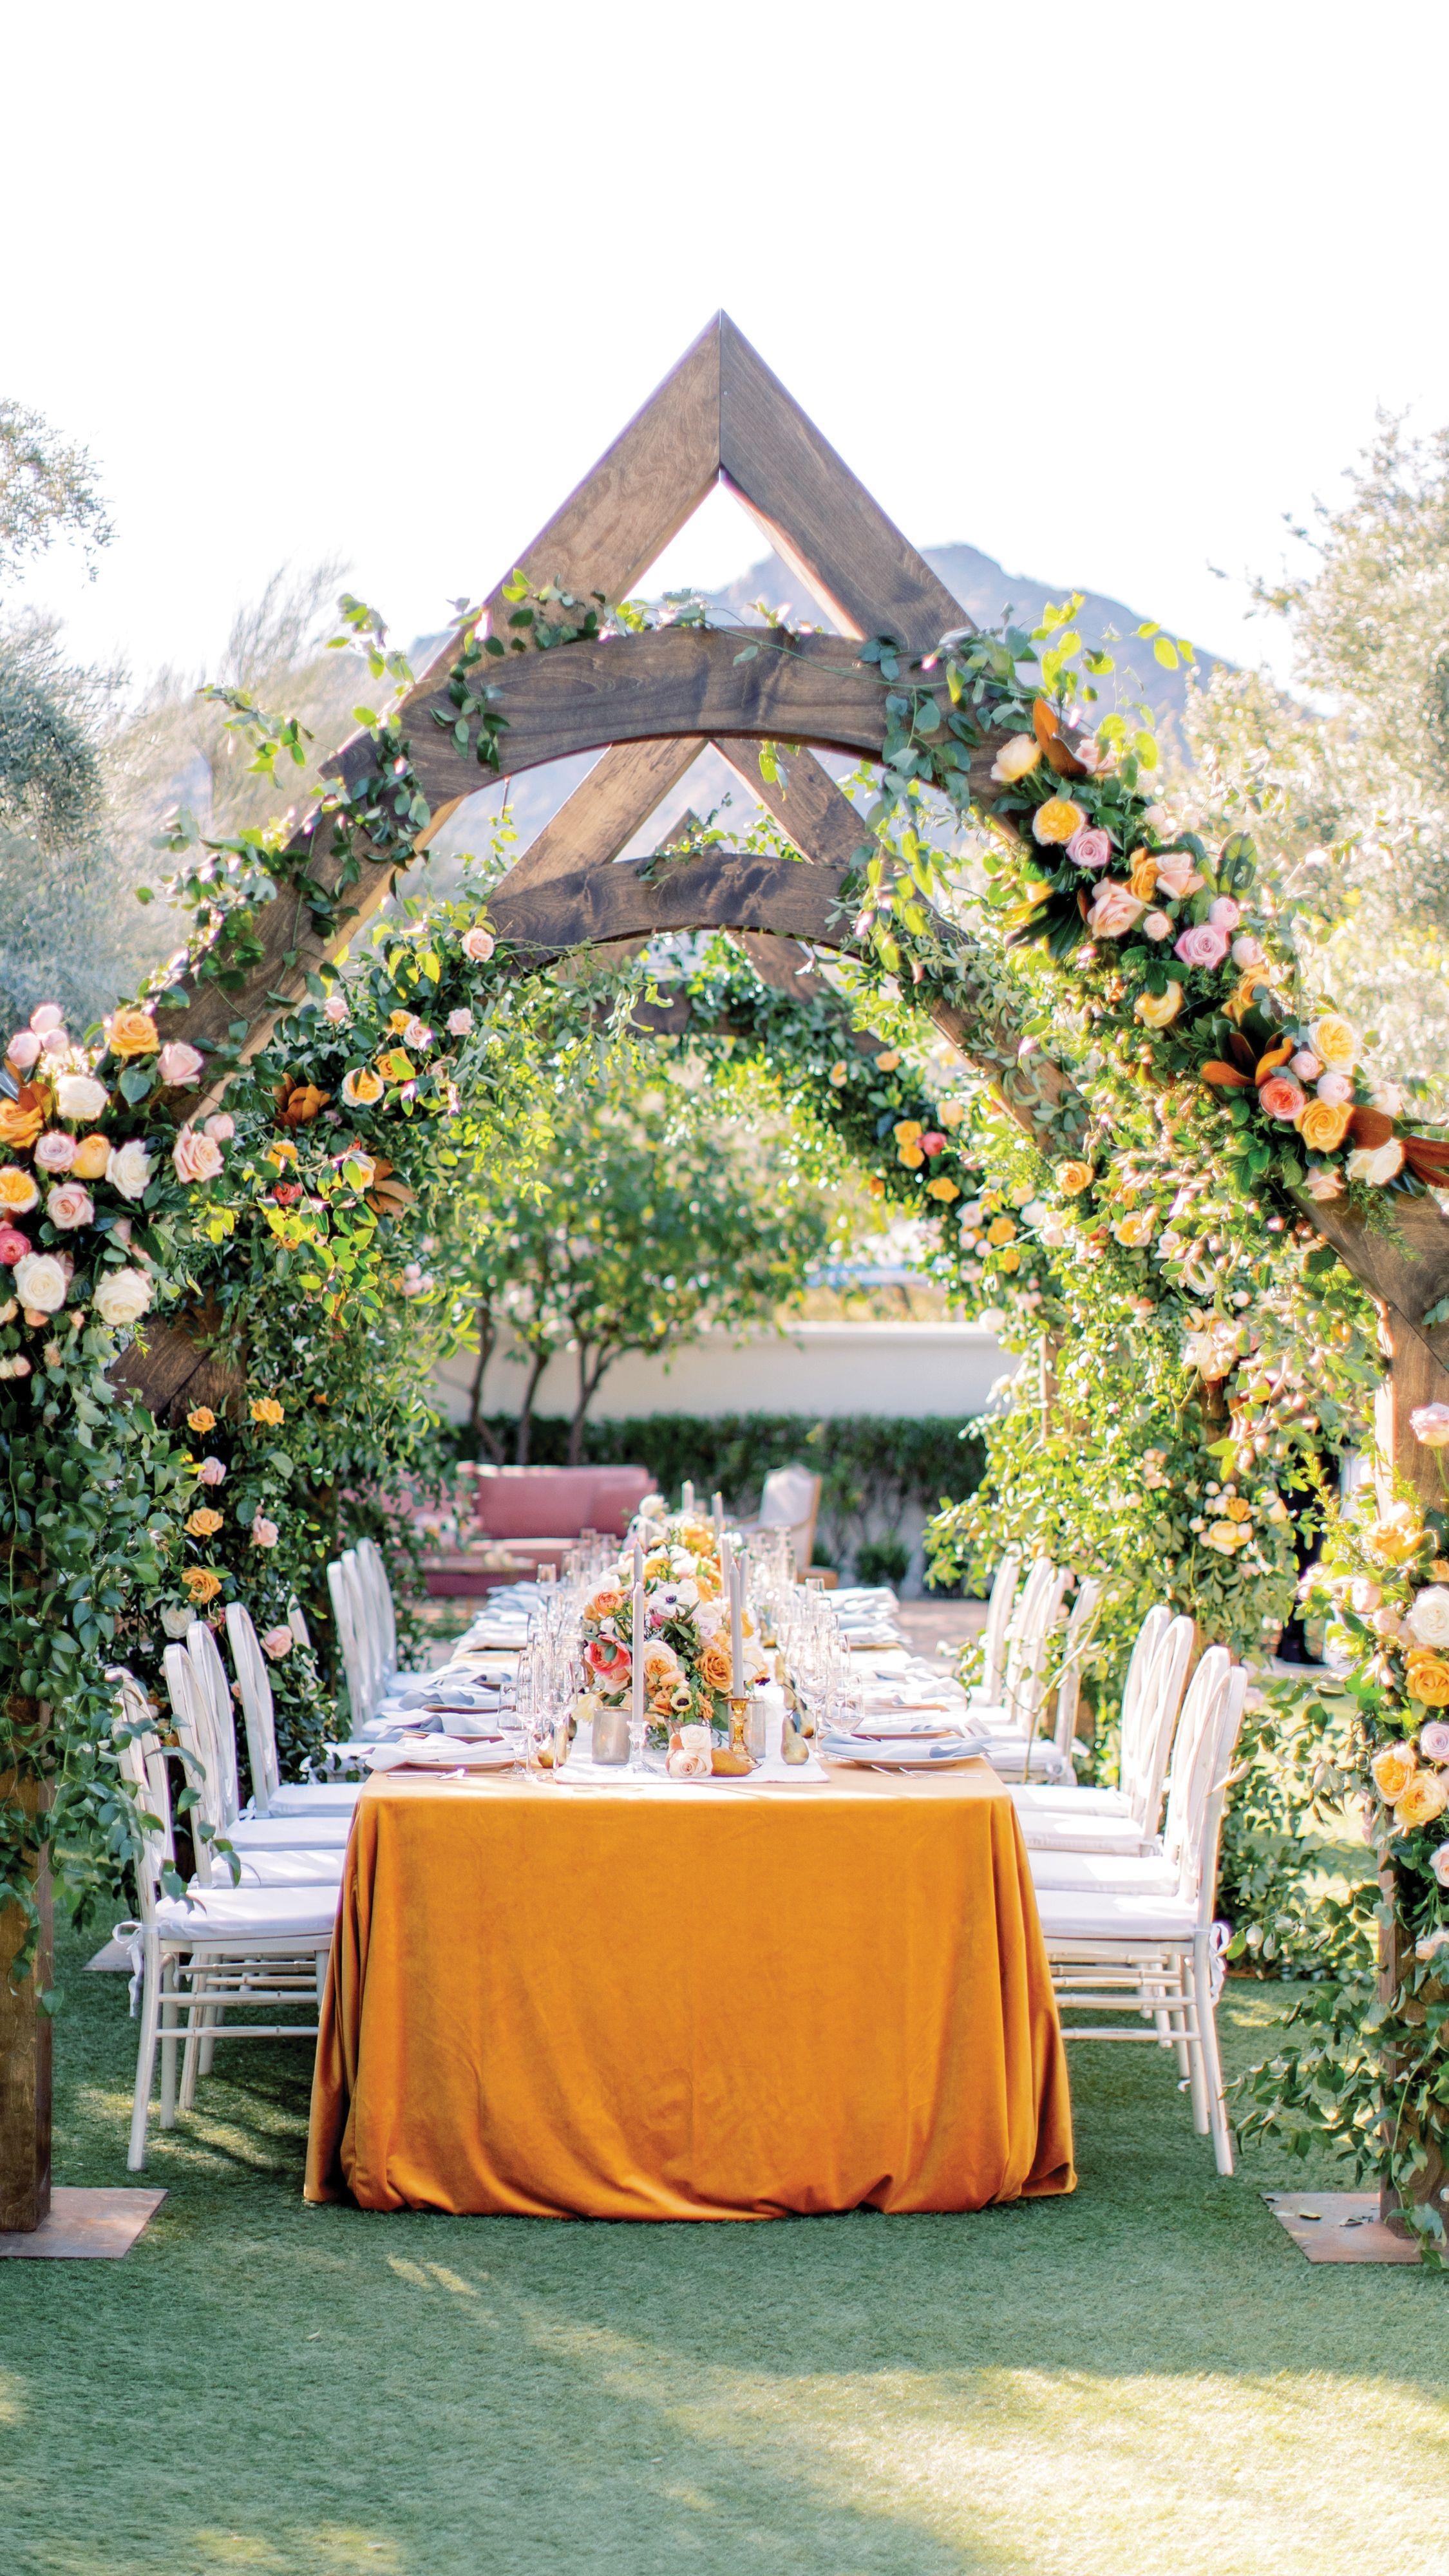 Desert Oasis Wedding in Arizona Starring Sunny Yellow